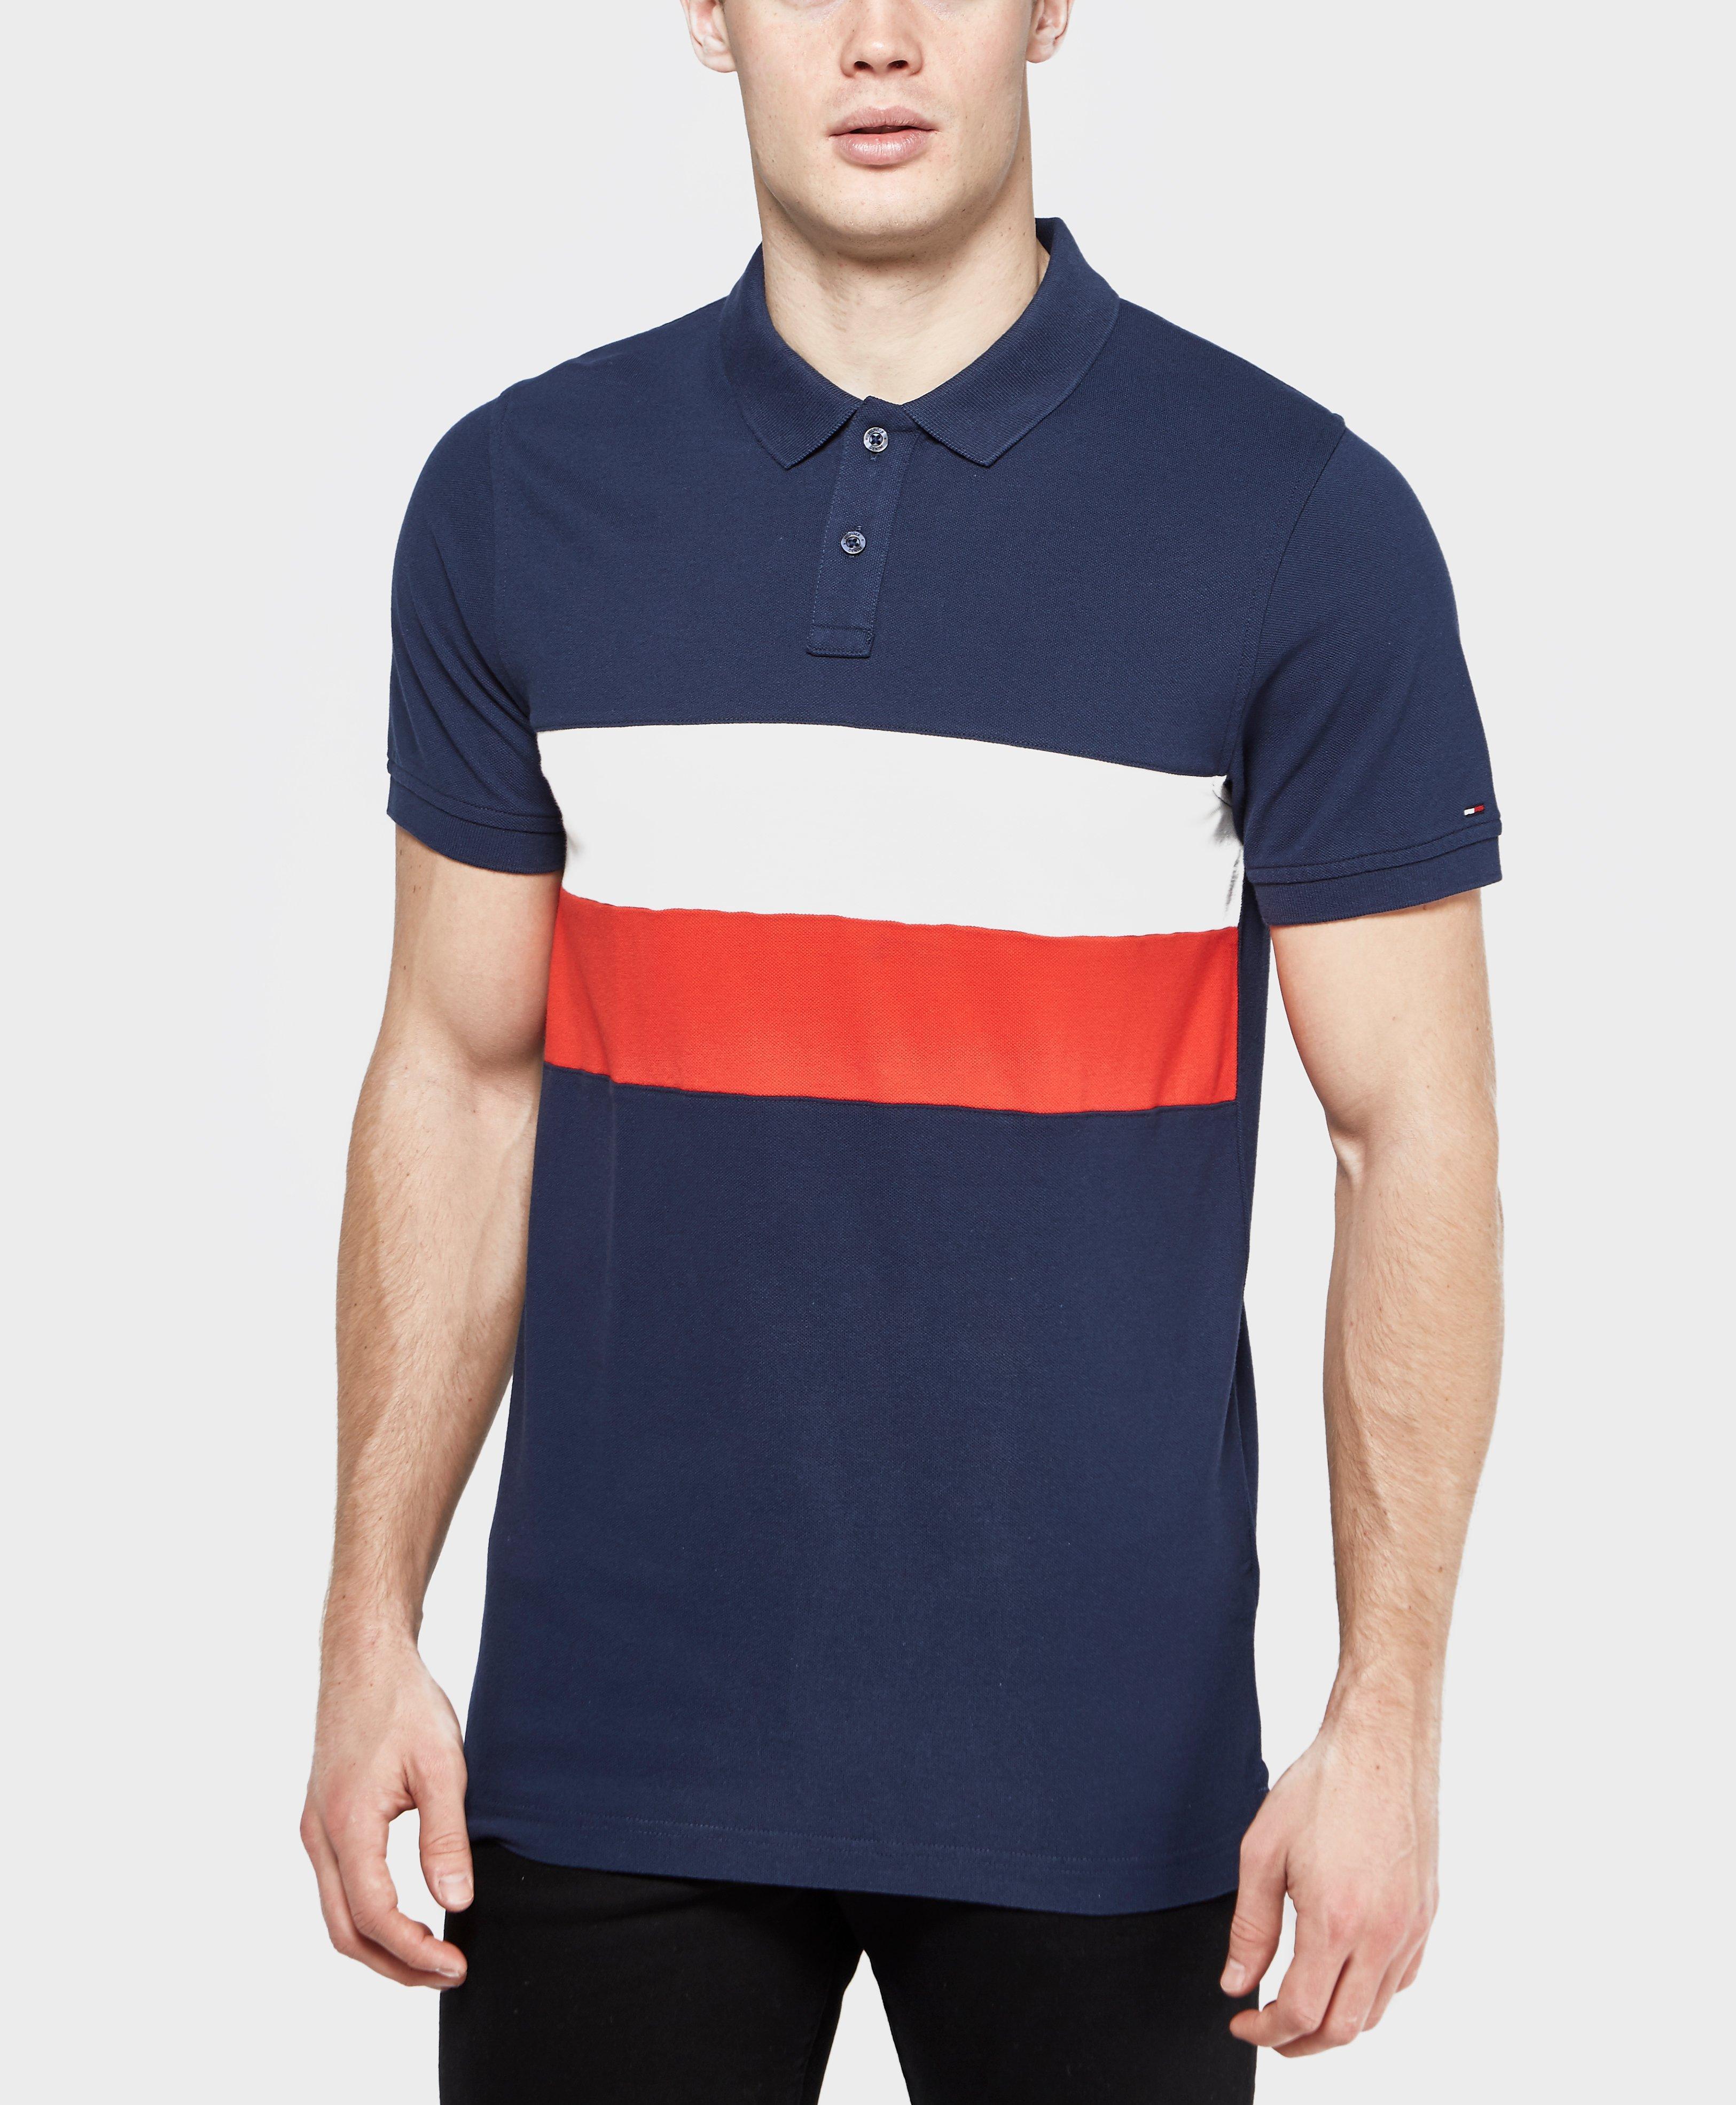 Cool Tee Shirt Designs | RLDM